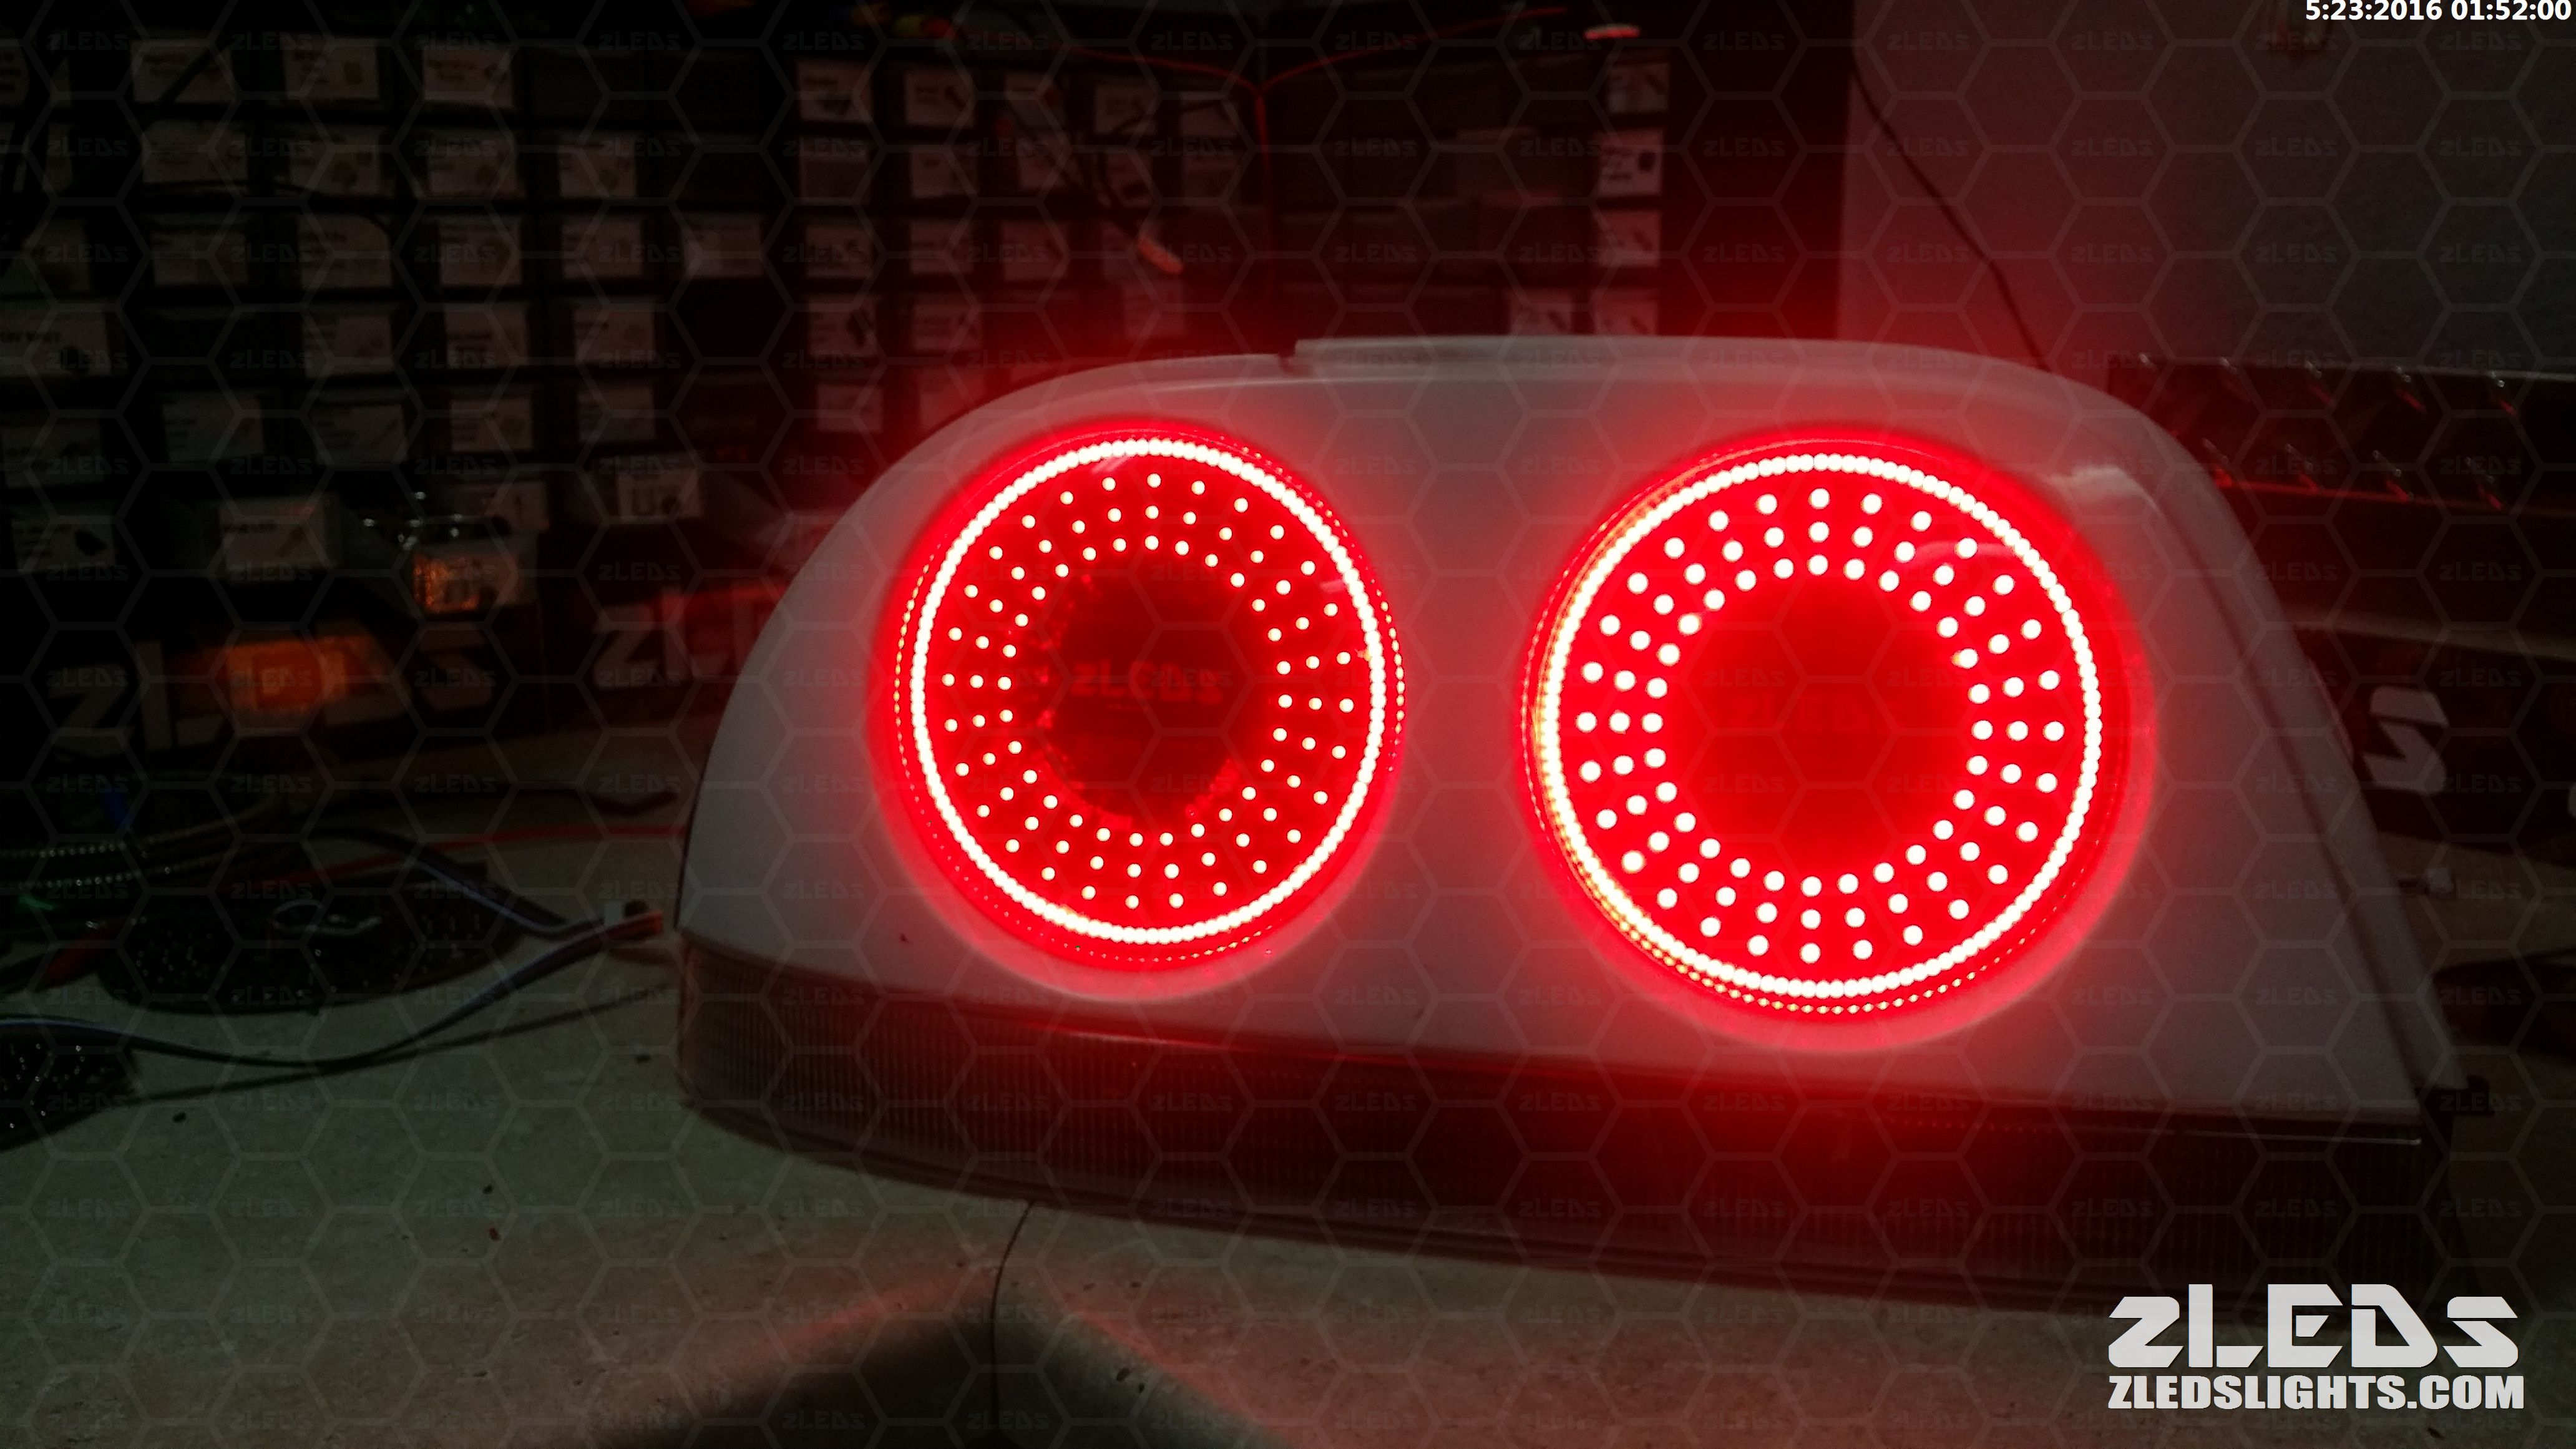 3B536 Trailer Light Wiring Diagram Nissan Gtr | Digital ... on chevrolet volt tail lights, bmw e46 tail lights, dodge ram srt-10 tail lights, mercury milan tail lights, isuzu rodeo tail lights, audi 100 tail lights, ford focus tail lights, range rover tail lights, audi a6 tail lights, ford bronco tail lights, ford ka tail lights, lexus ls tail lights, ford mustang tail lights, land rover defender tail lights, holden monaro tail lights, chevrolet camaro tail lights, subaru forester tail lights, bentley continental gt tail lights, hummer h2 tail lights, ford explorer sport trac tail lights,